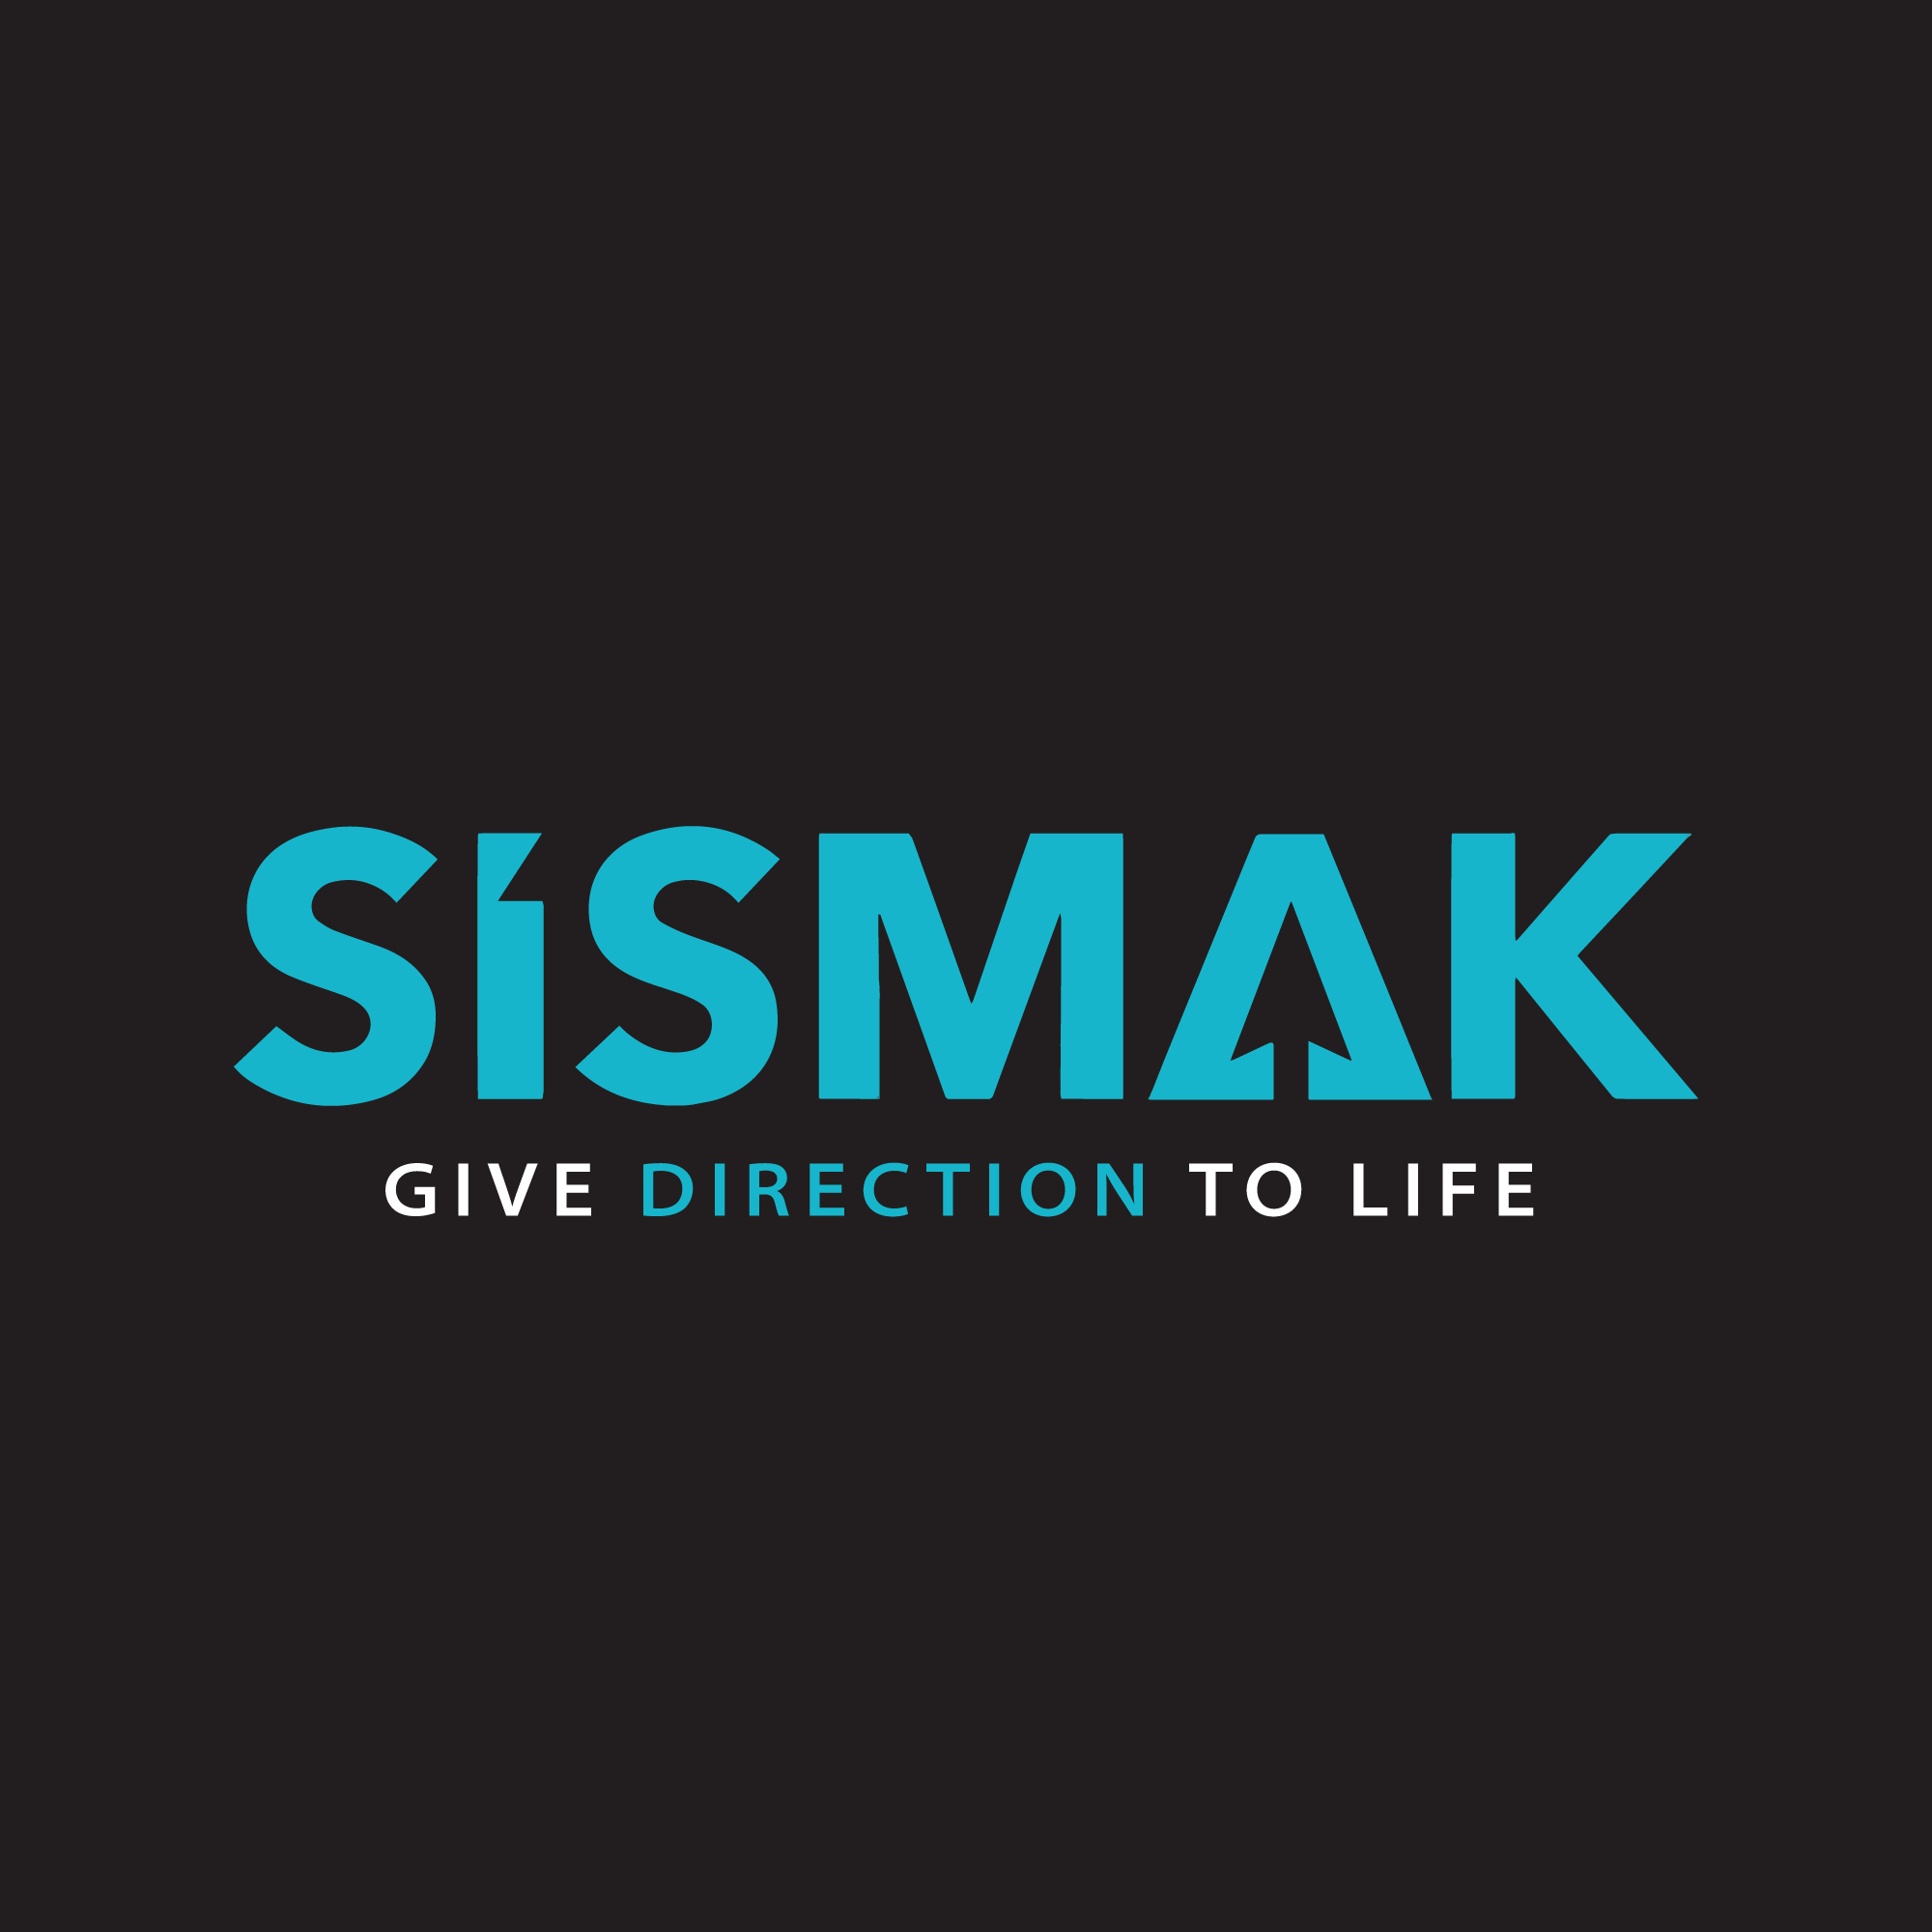 sismak-give-direction-to-life